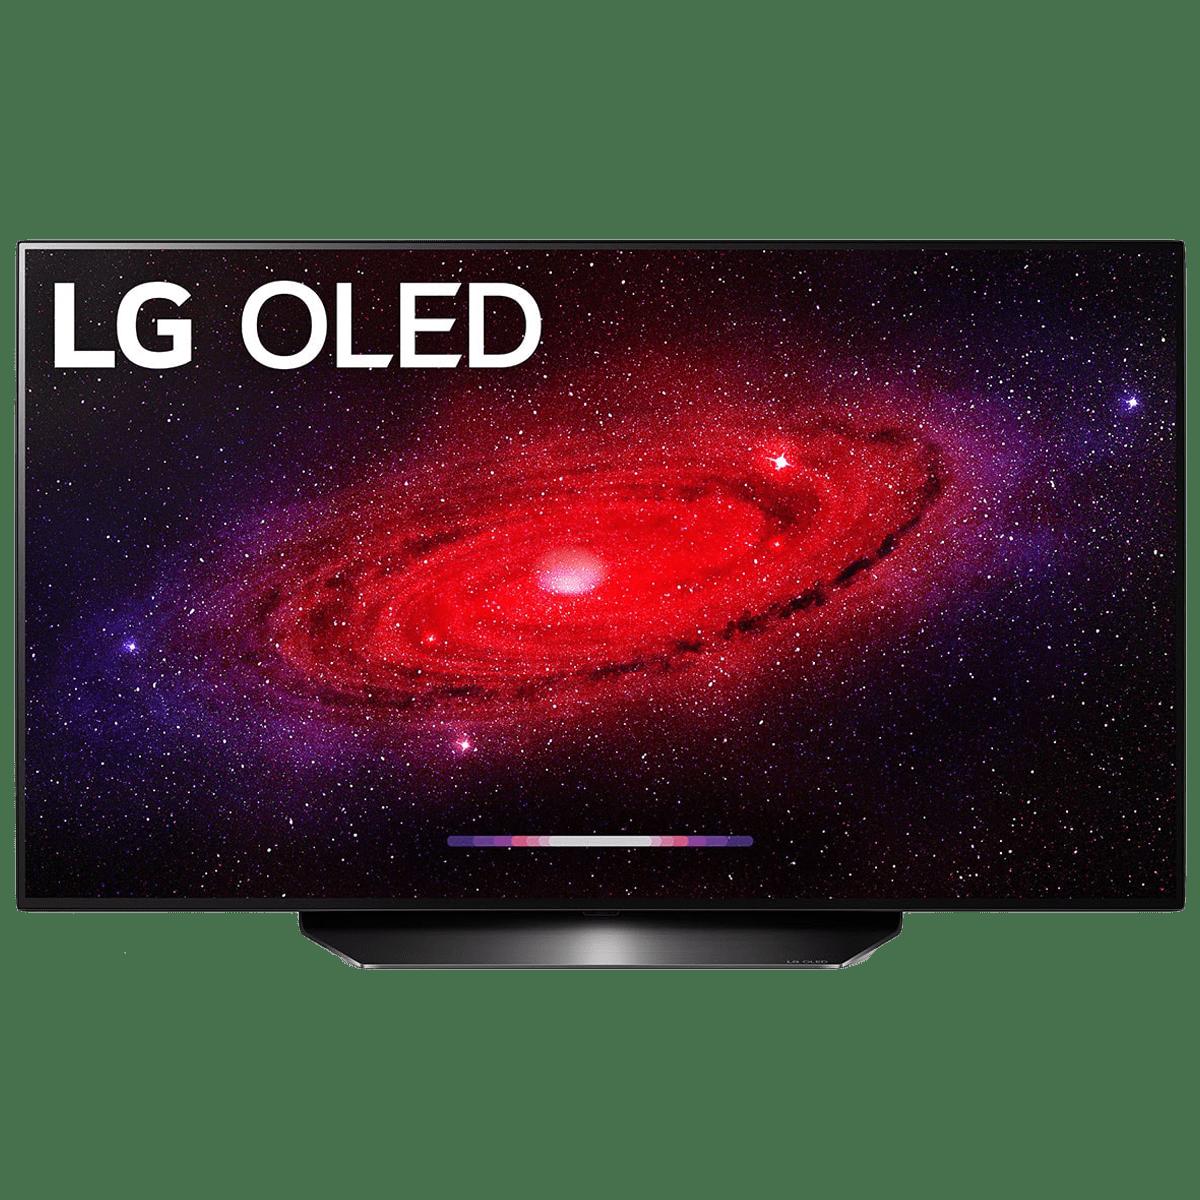 LG CX Series 121.92cm (48 Inch) Ultra HD 4K OLED Smart TV (Self Lighting Pixel Dimming, OLED48CXPTA, Black)